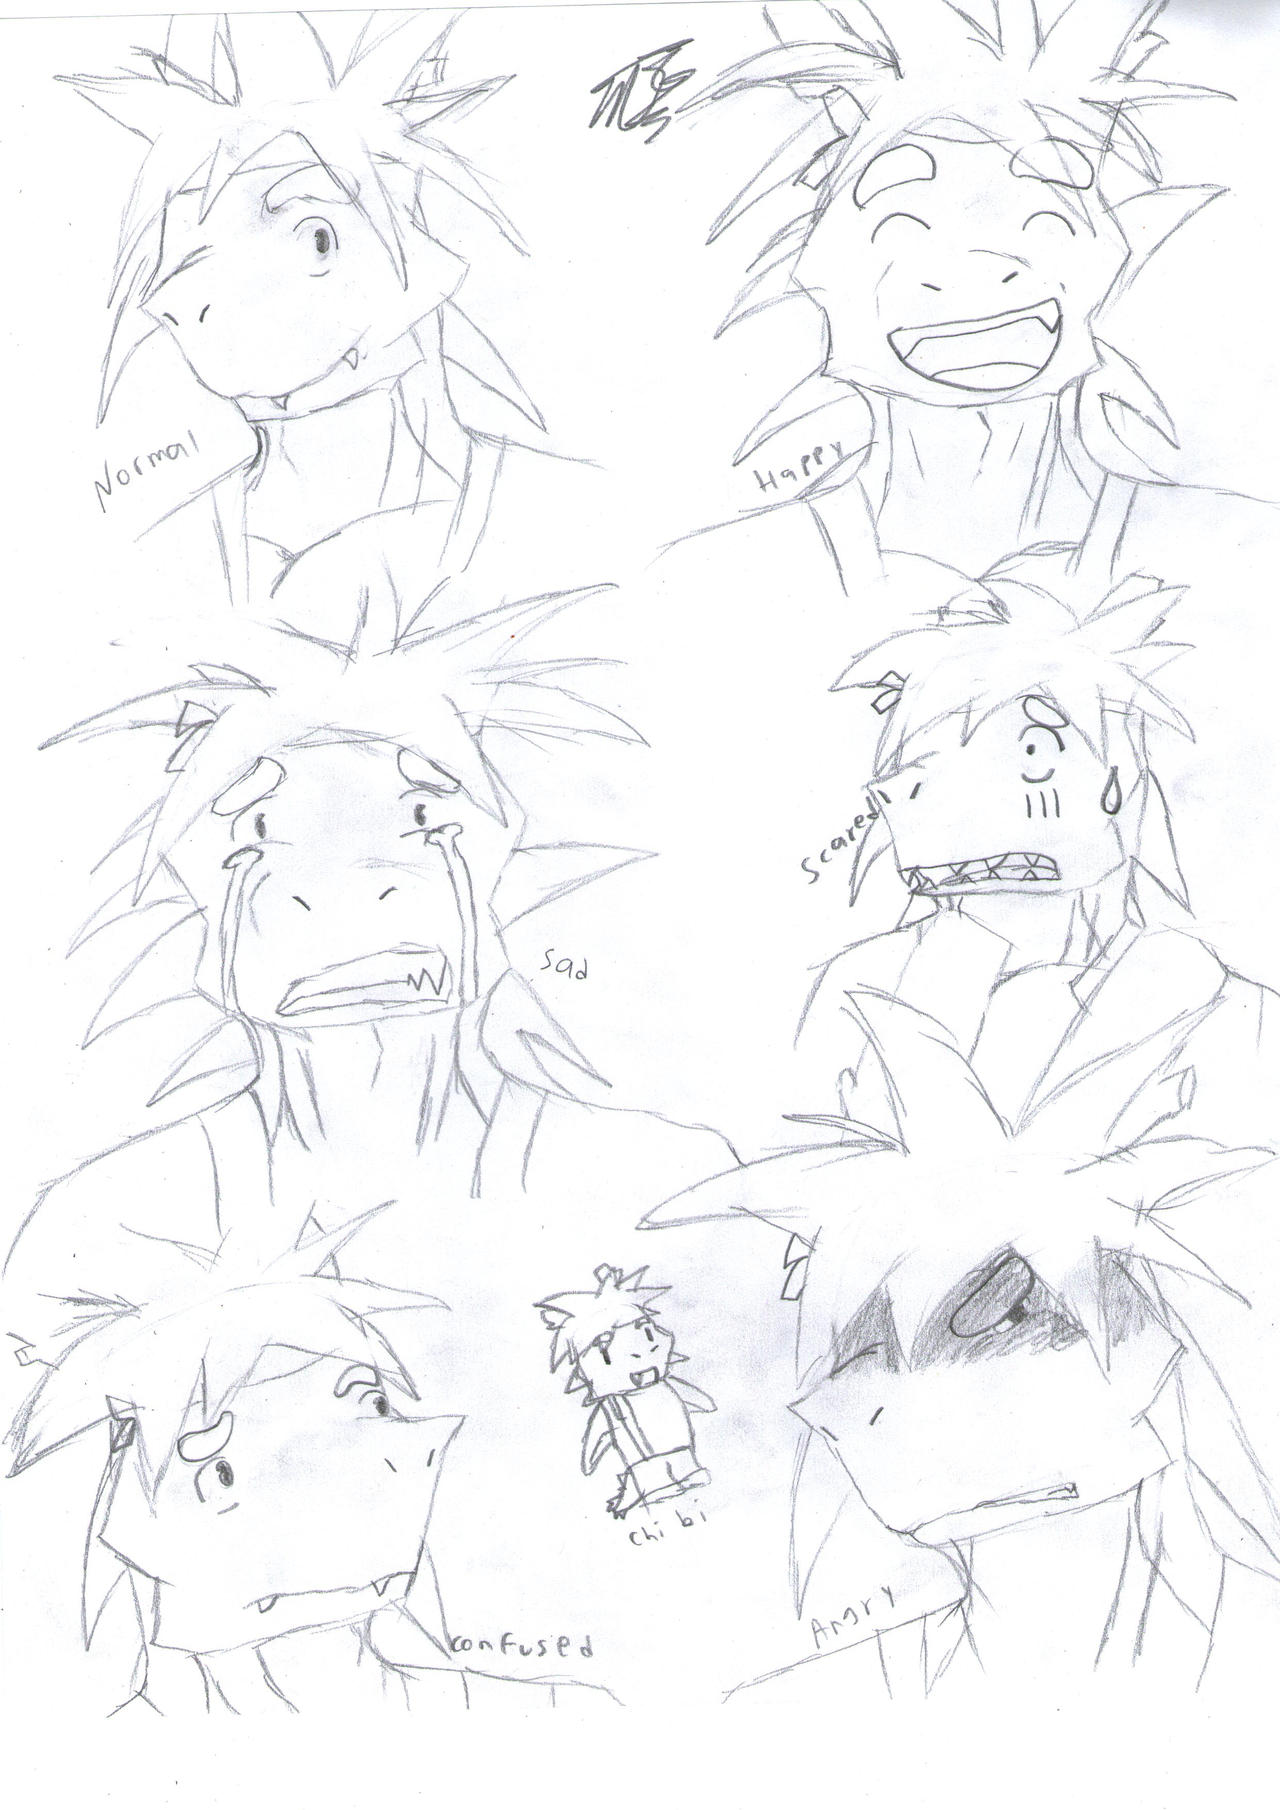 Tatsukis Espressions by DG254